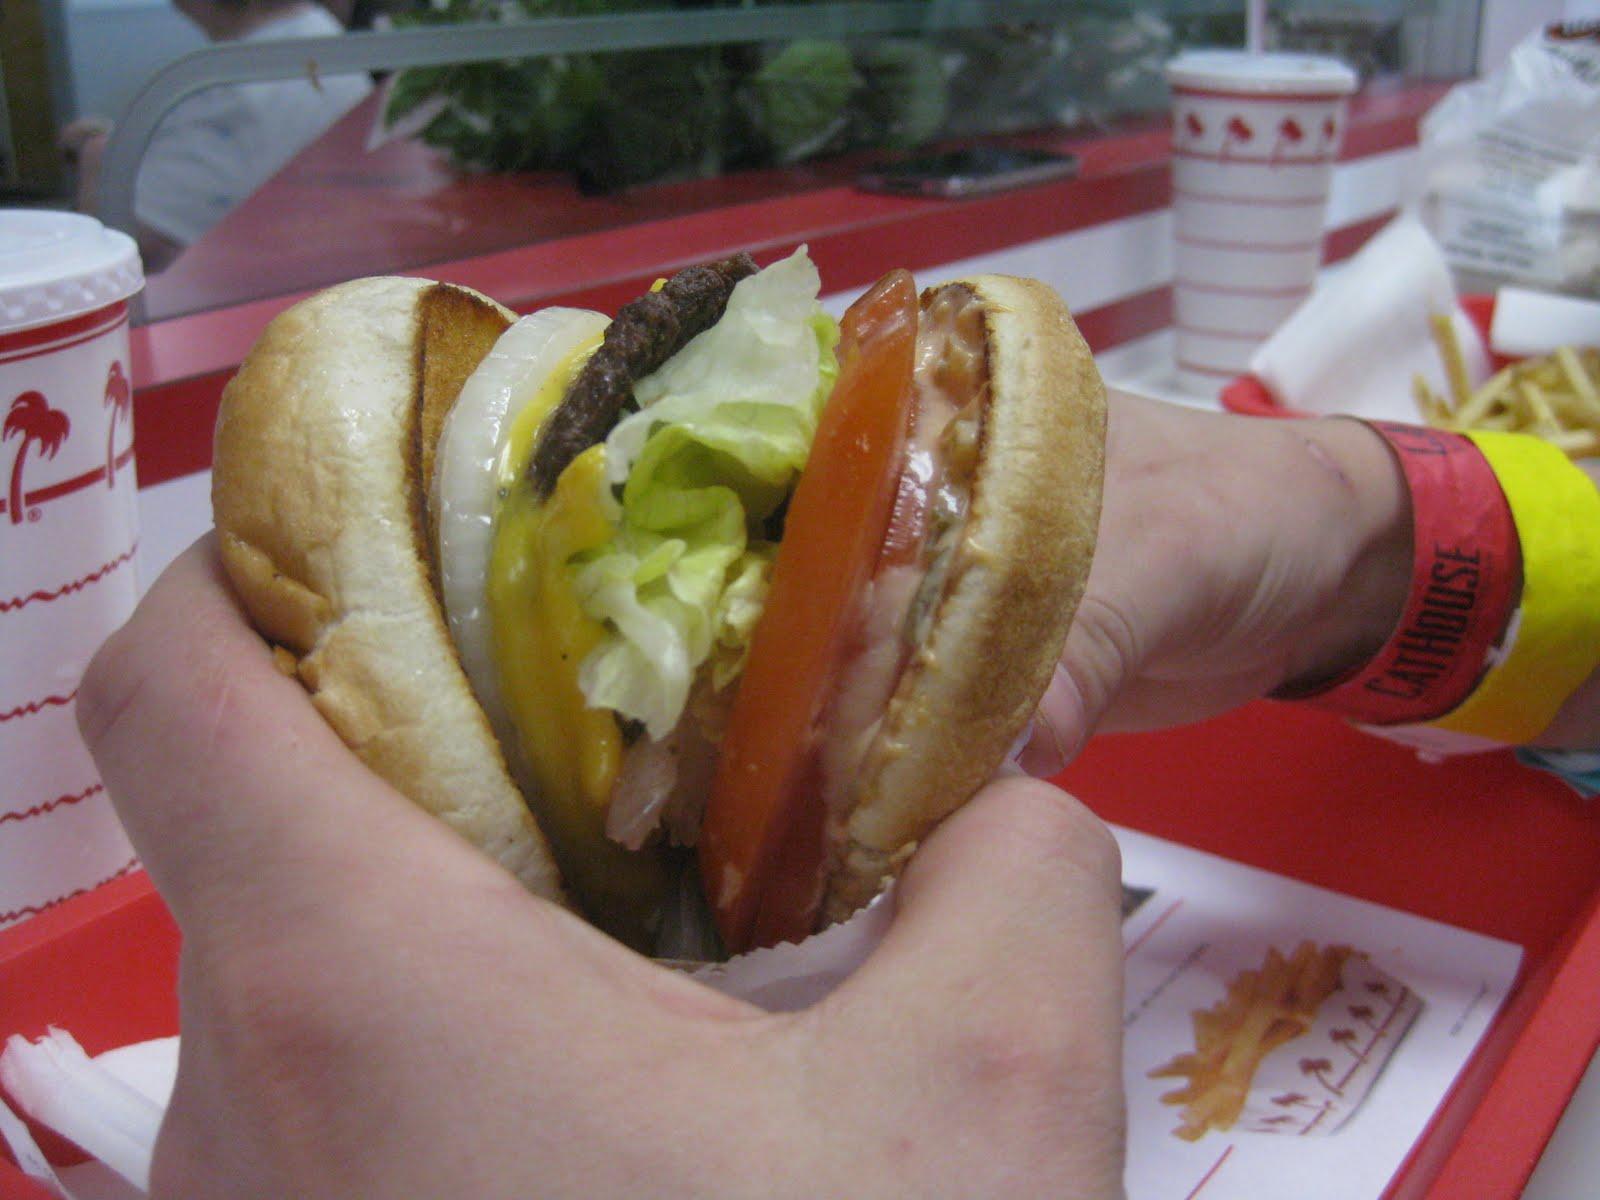 Mcdonalds Hot Dogs